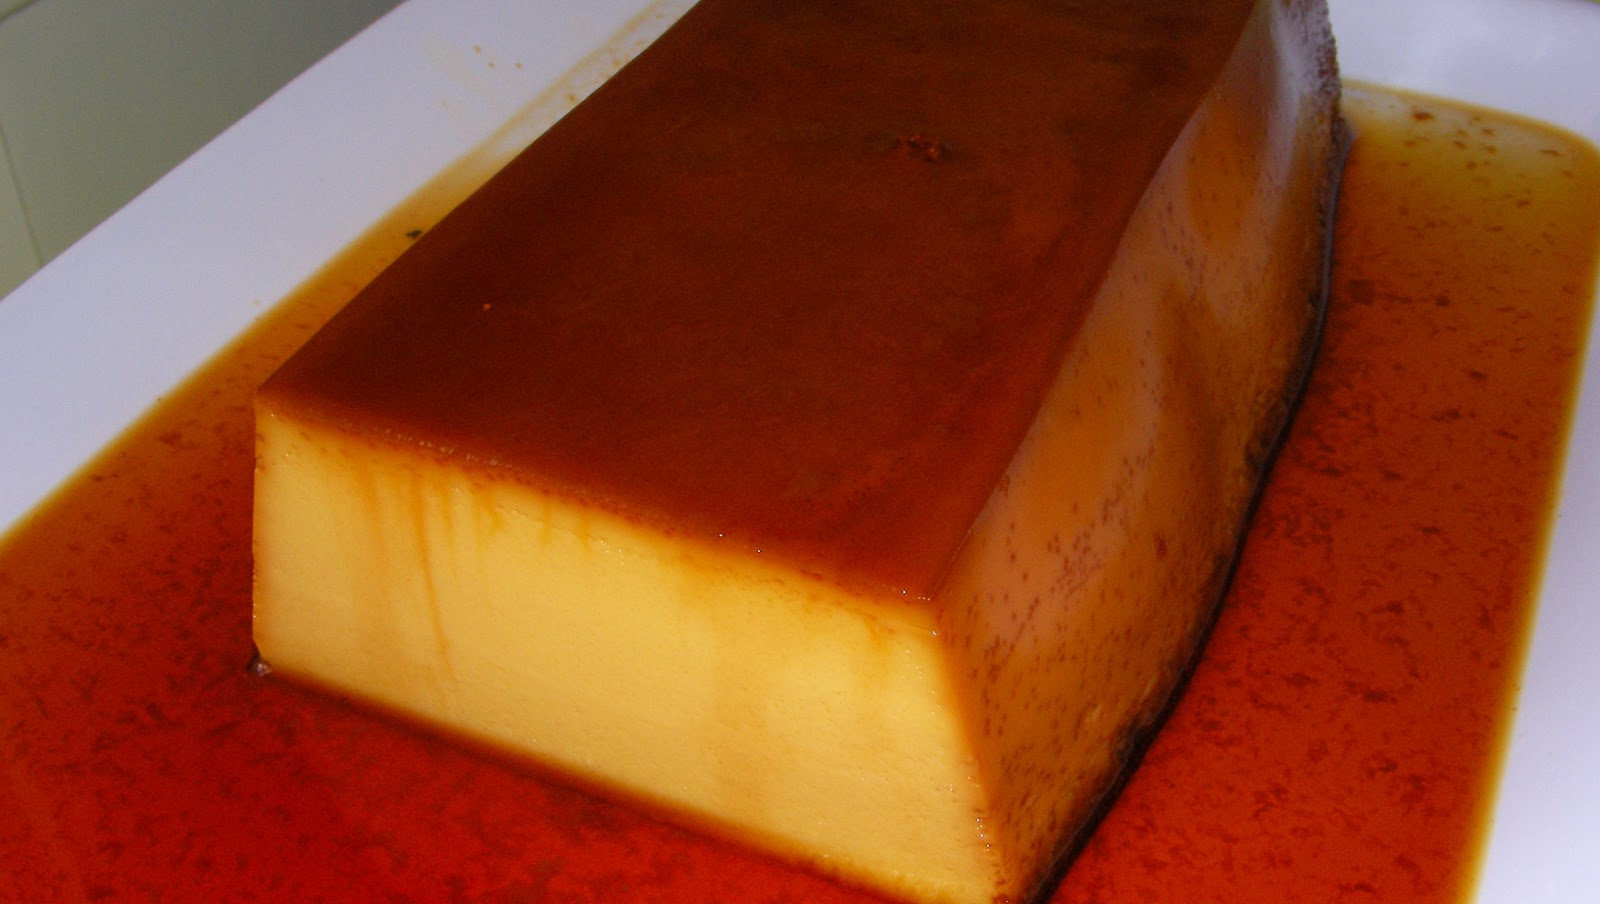 Receta flan casero de queso semicurado garcia baquero for Ingredientes para hacer flan casero